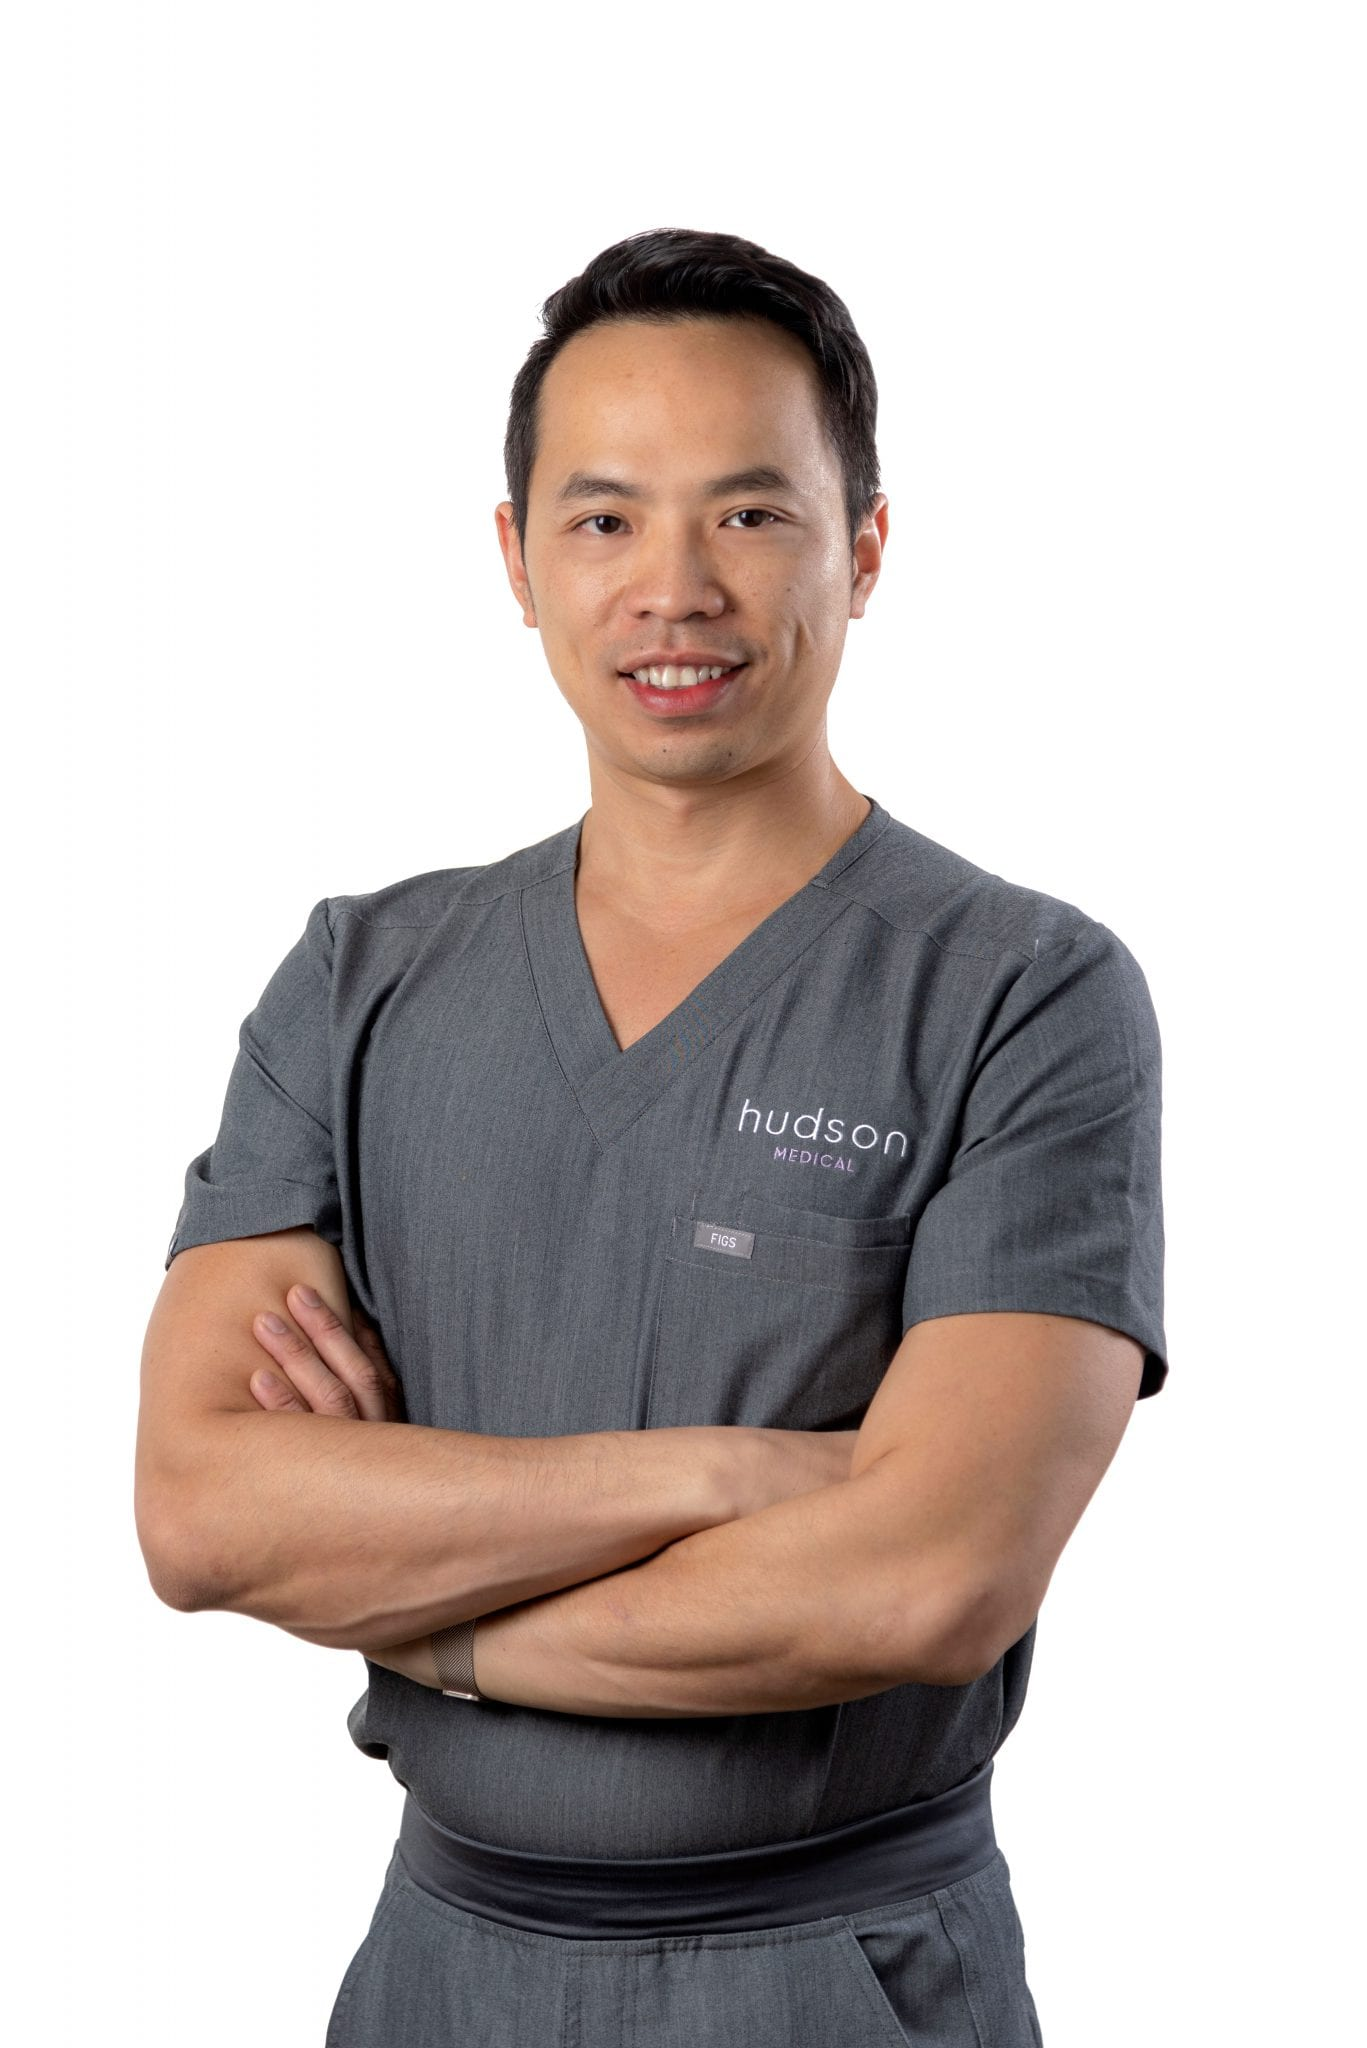 Jonathann Kuo, MD - Hudson Medical